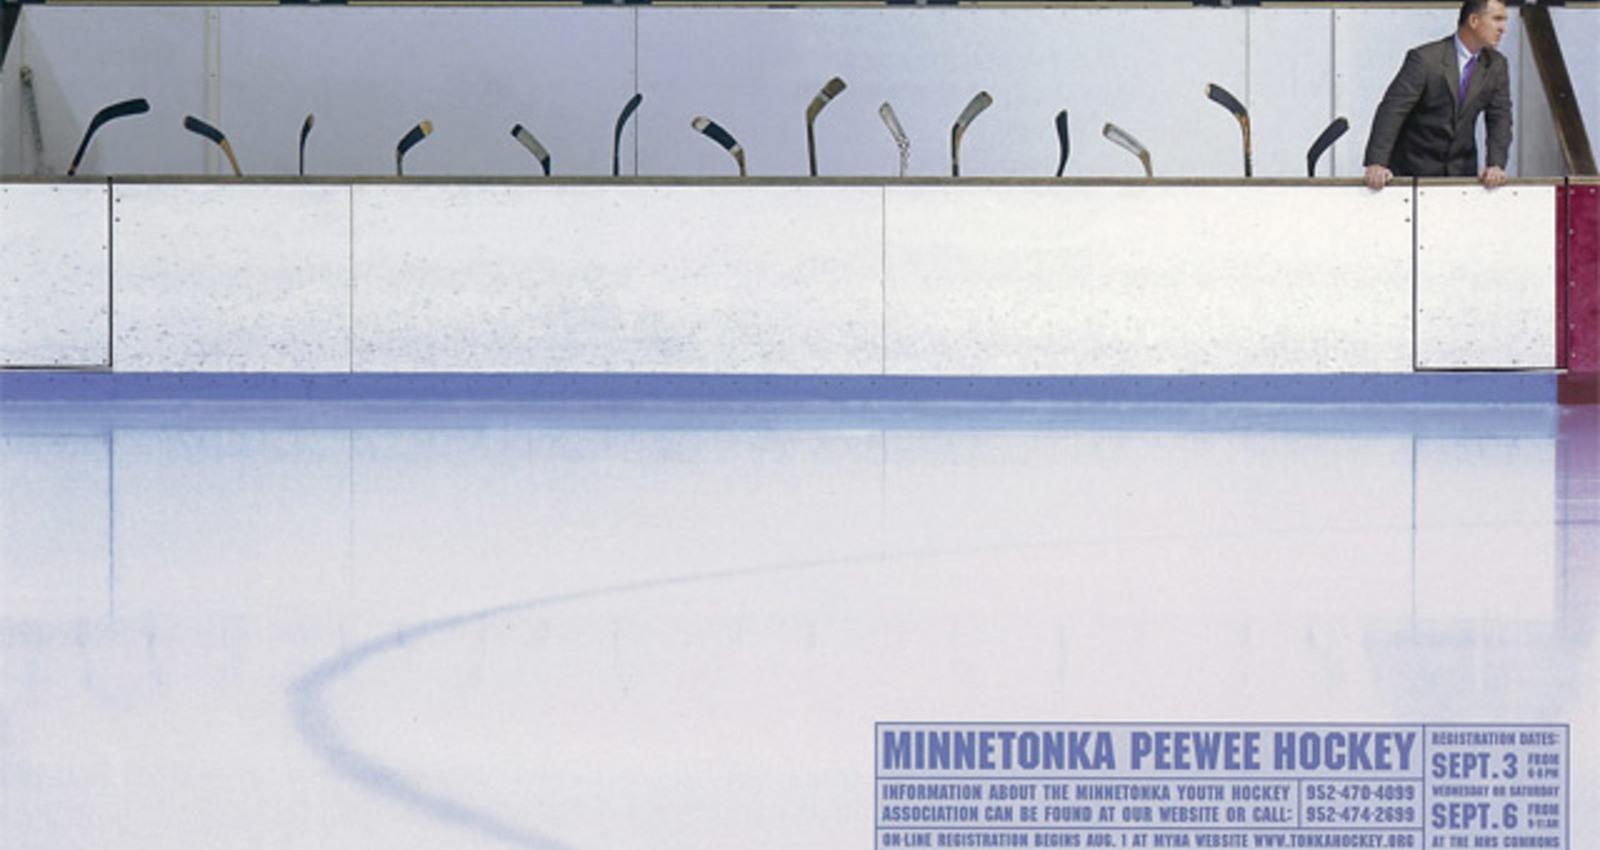 Peewee Hockey